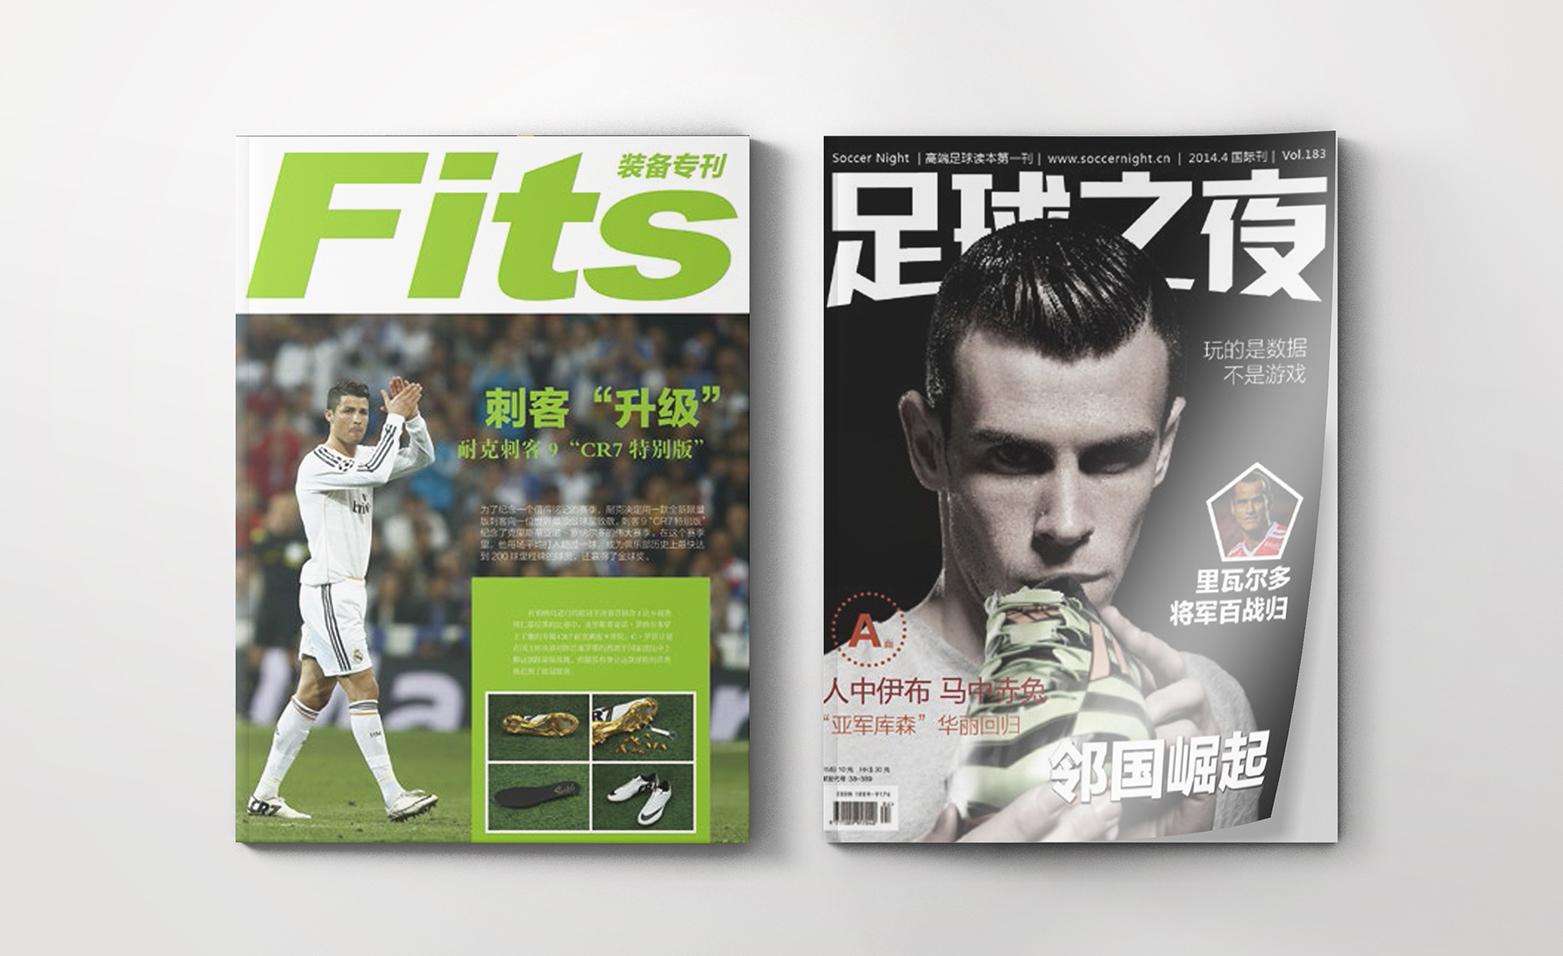 CCTV-5《足球之夜》 杂志月刊 封面及内页版式设计